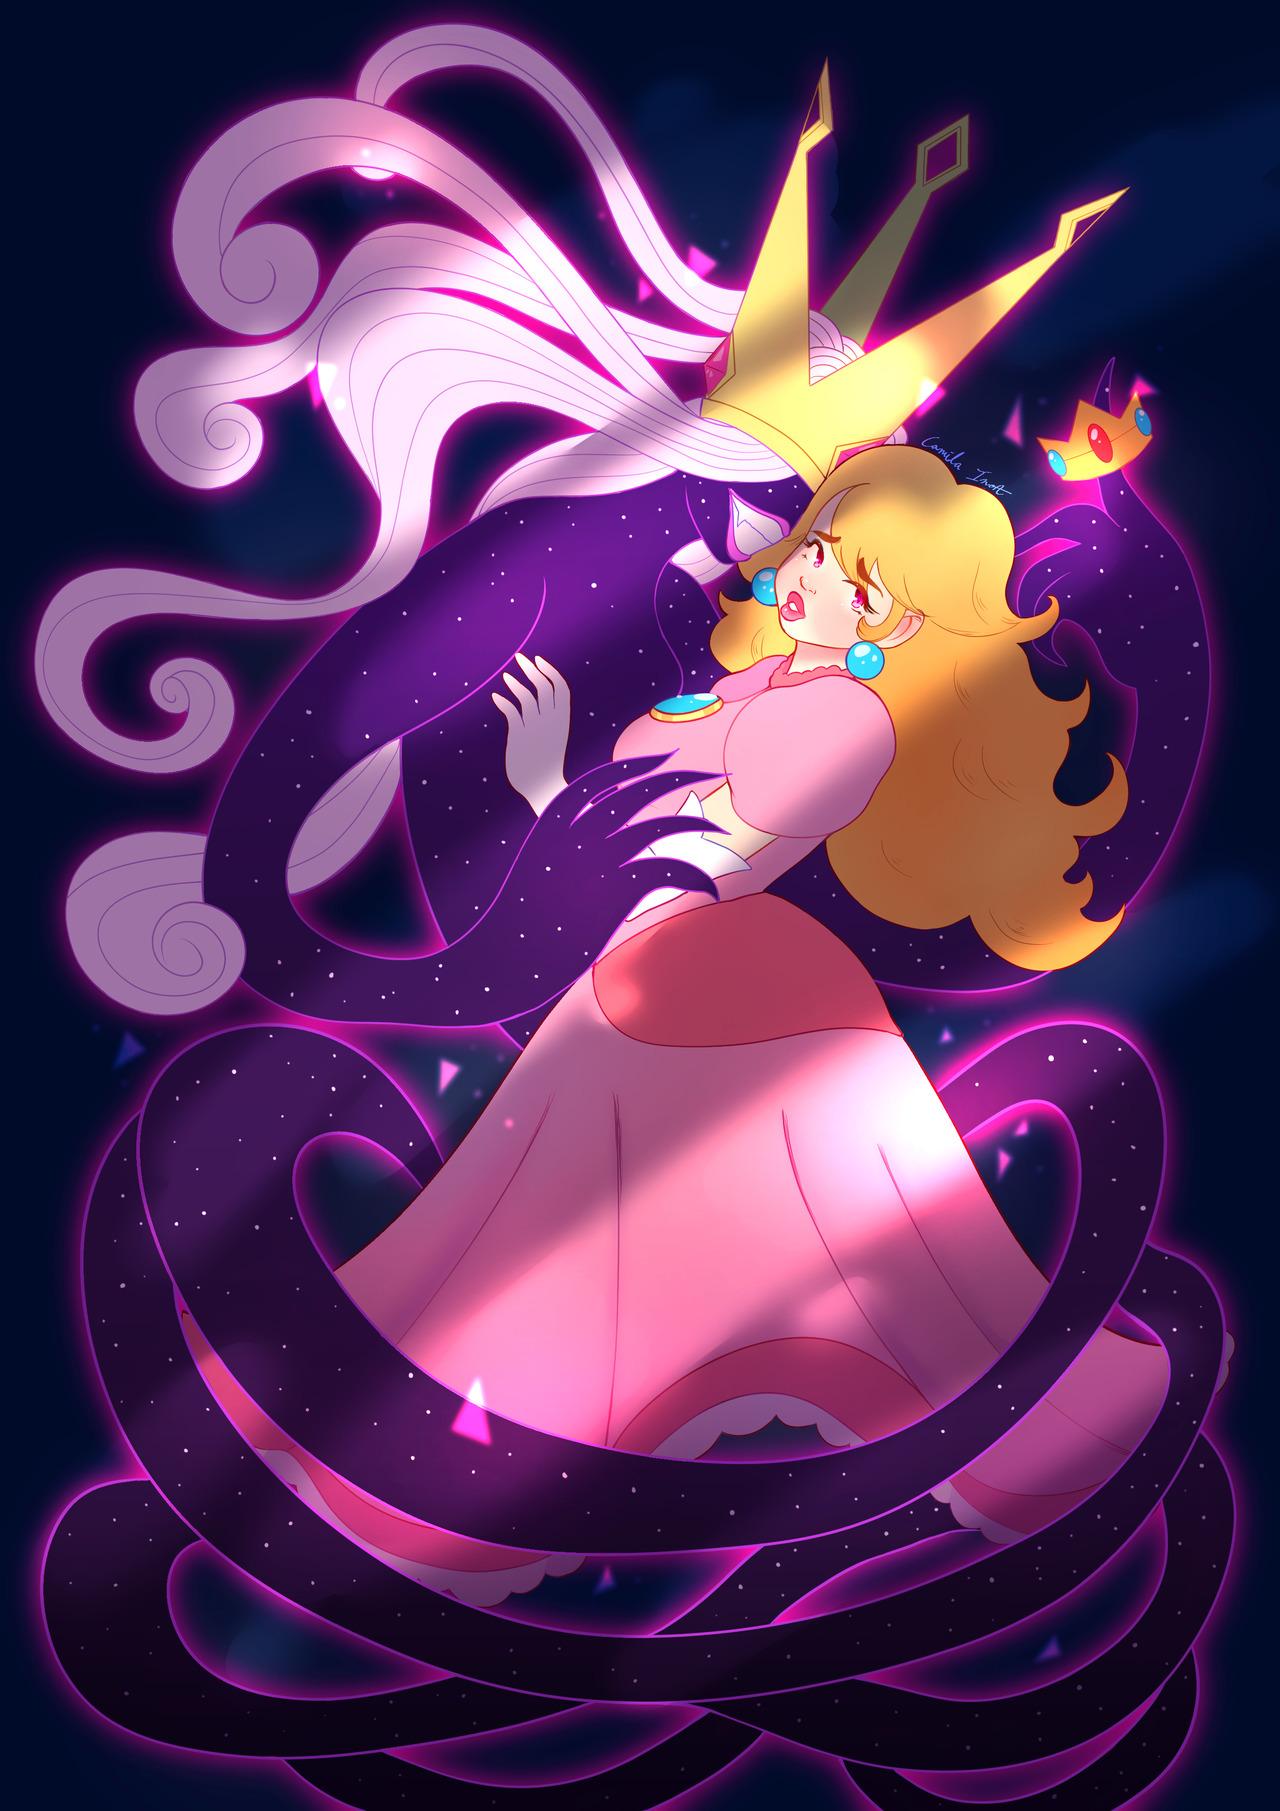 Shadow Queen Super Mario Bros Zerochan Anime Image Board